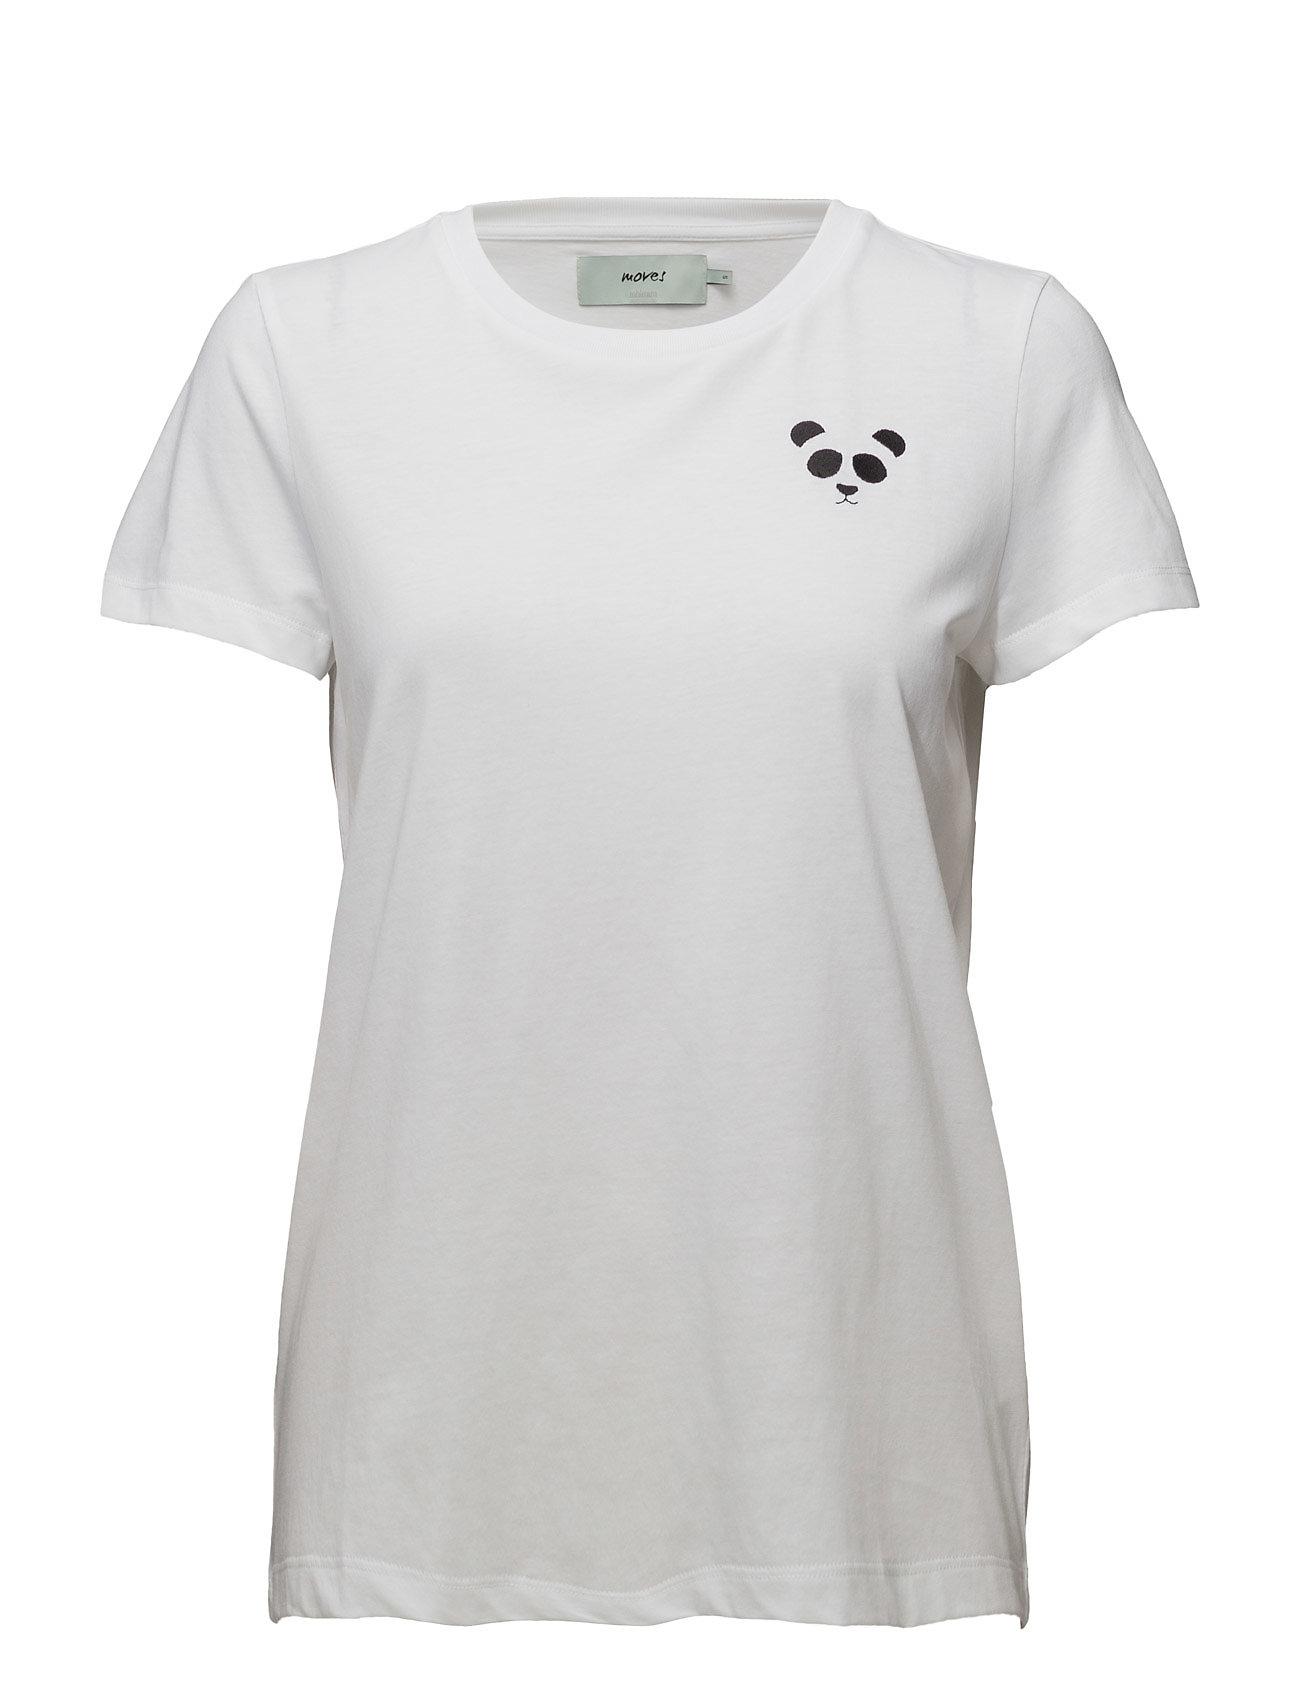 Moves lulu - panda